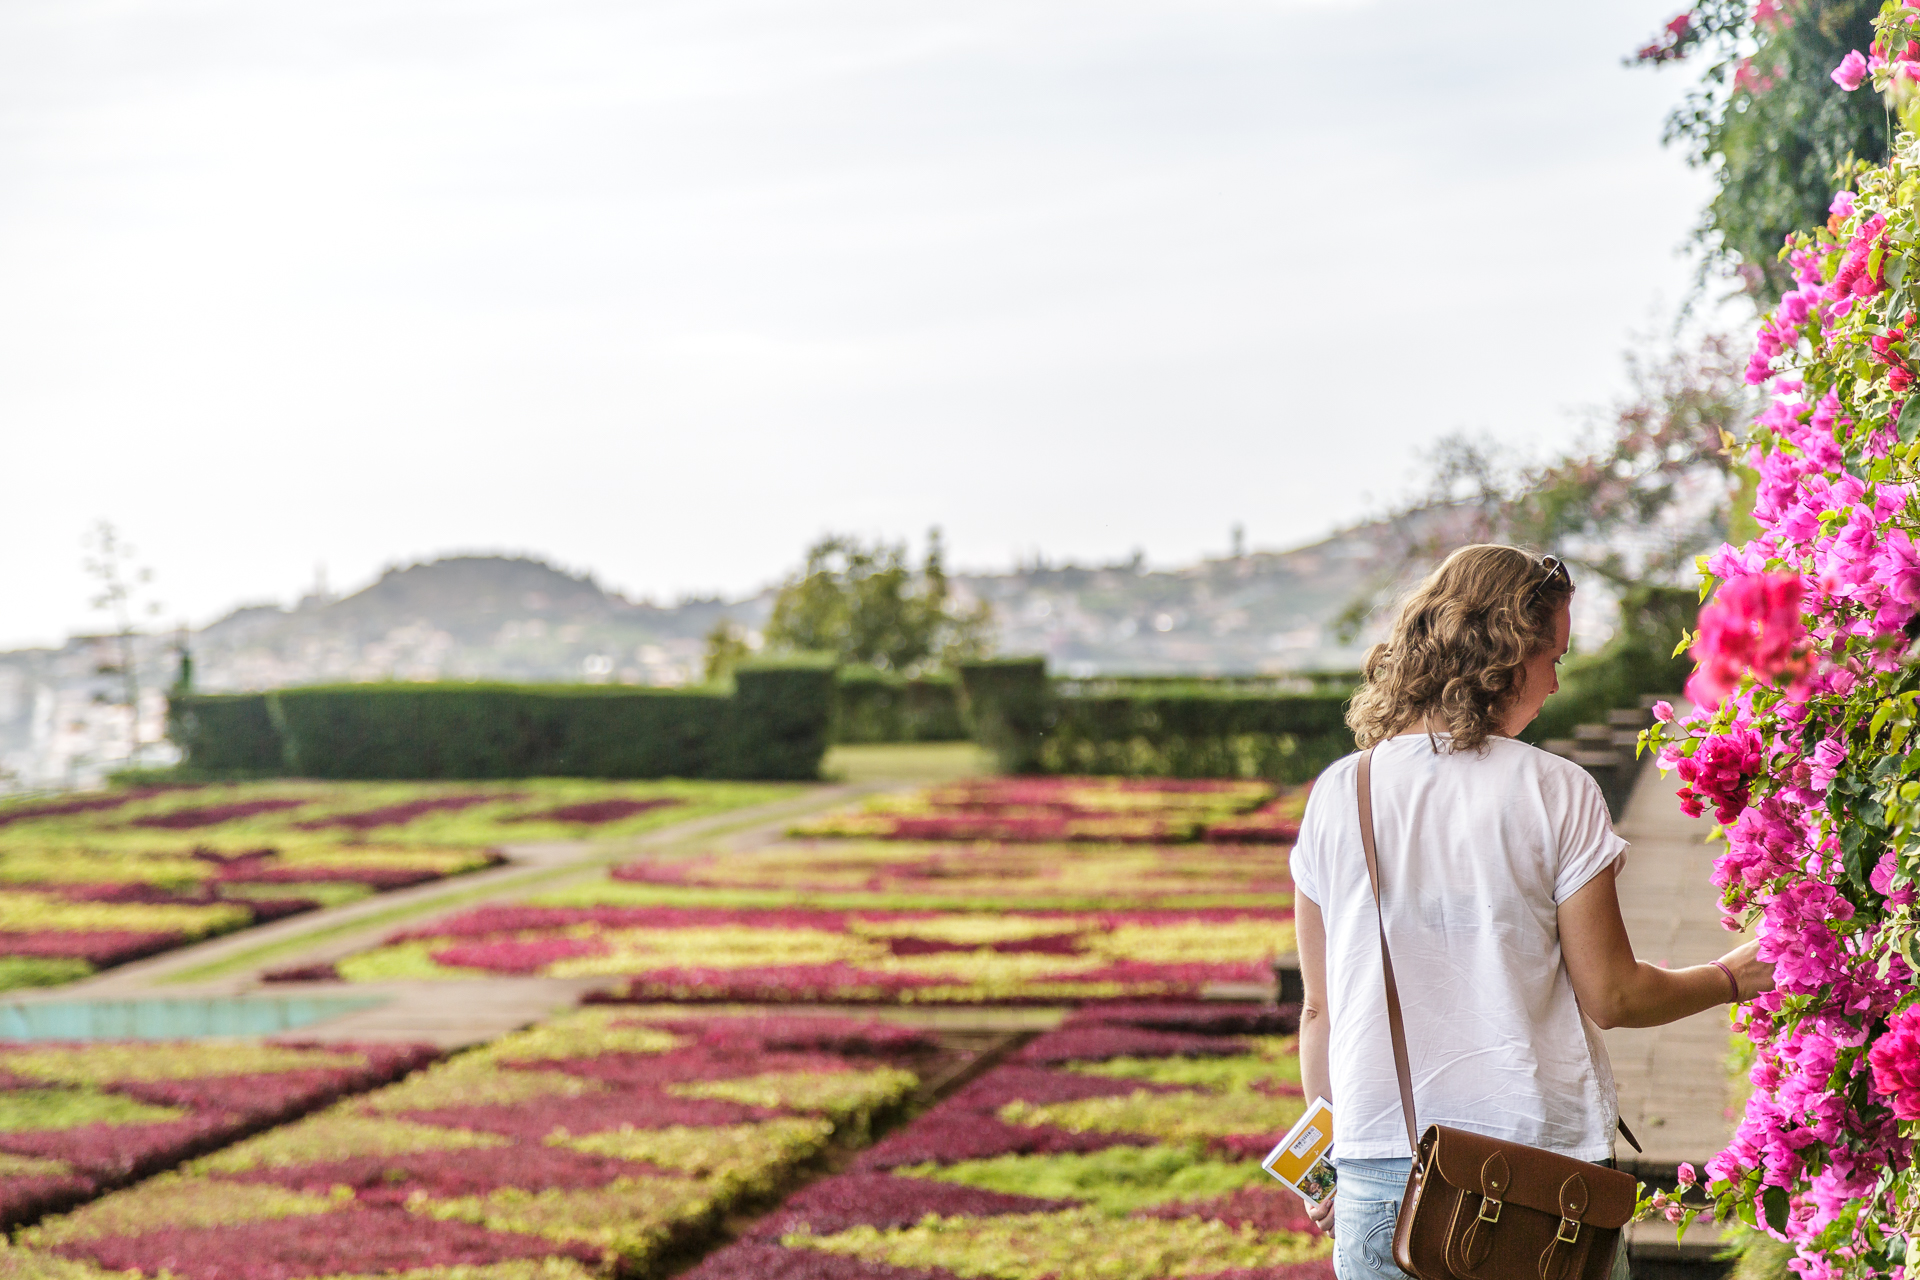 Jardim-Botanico-Funchal-4